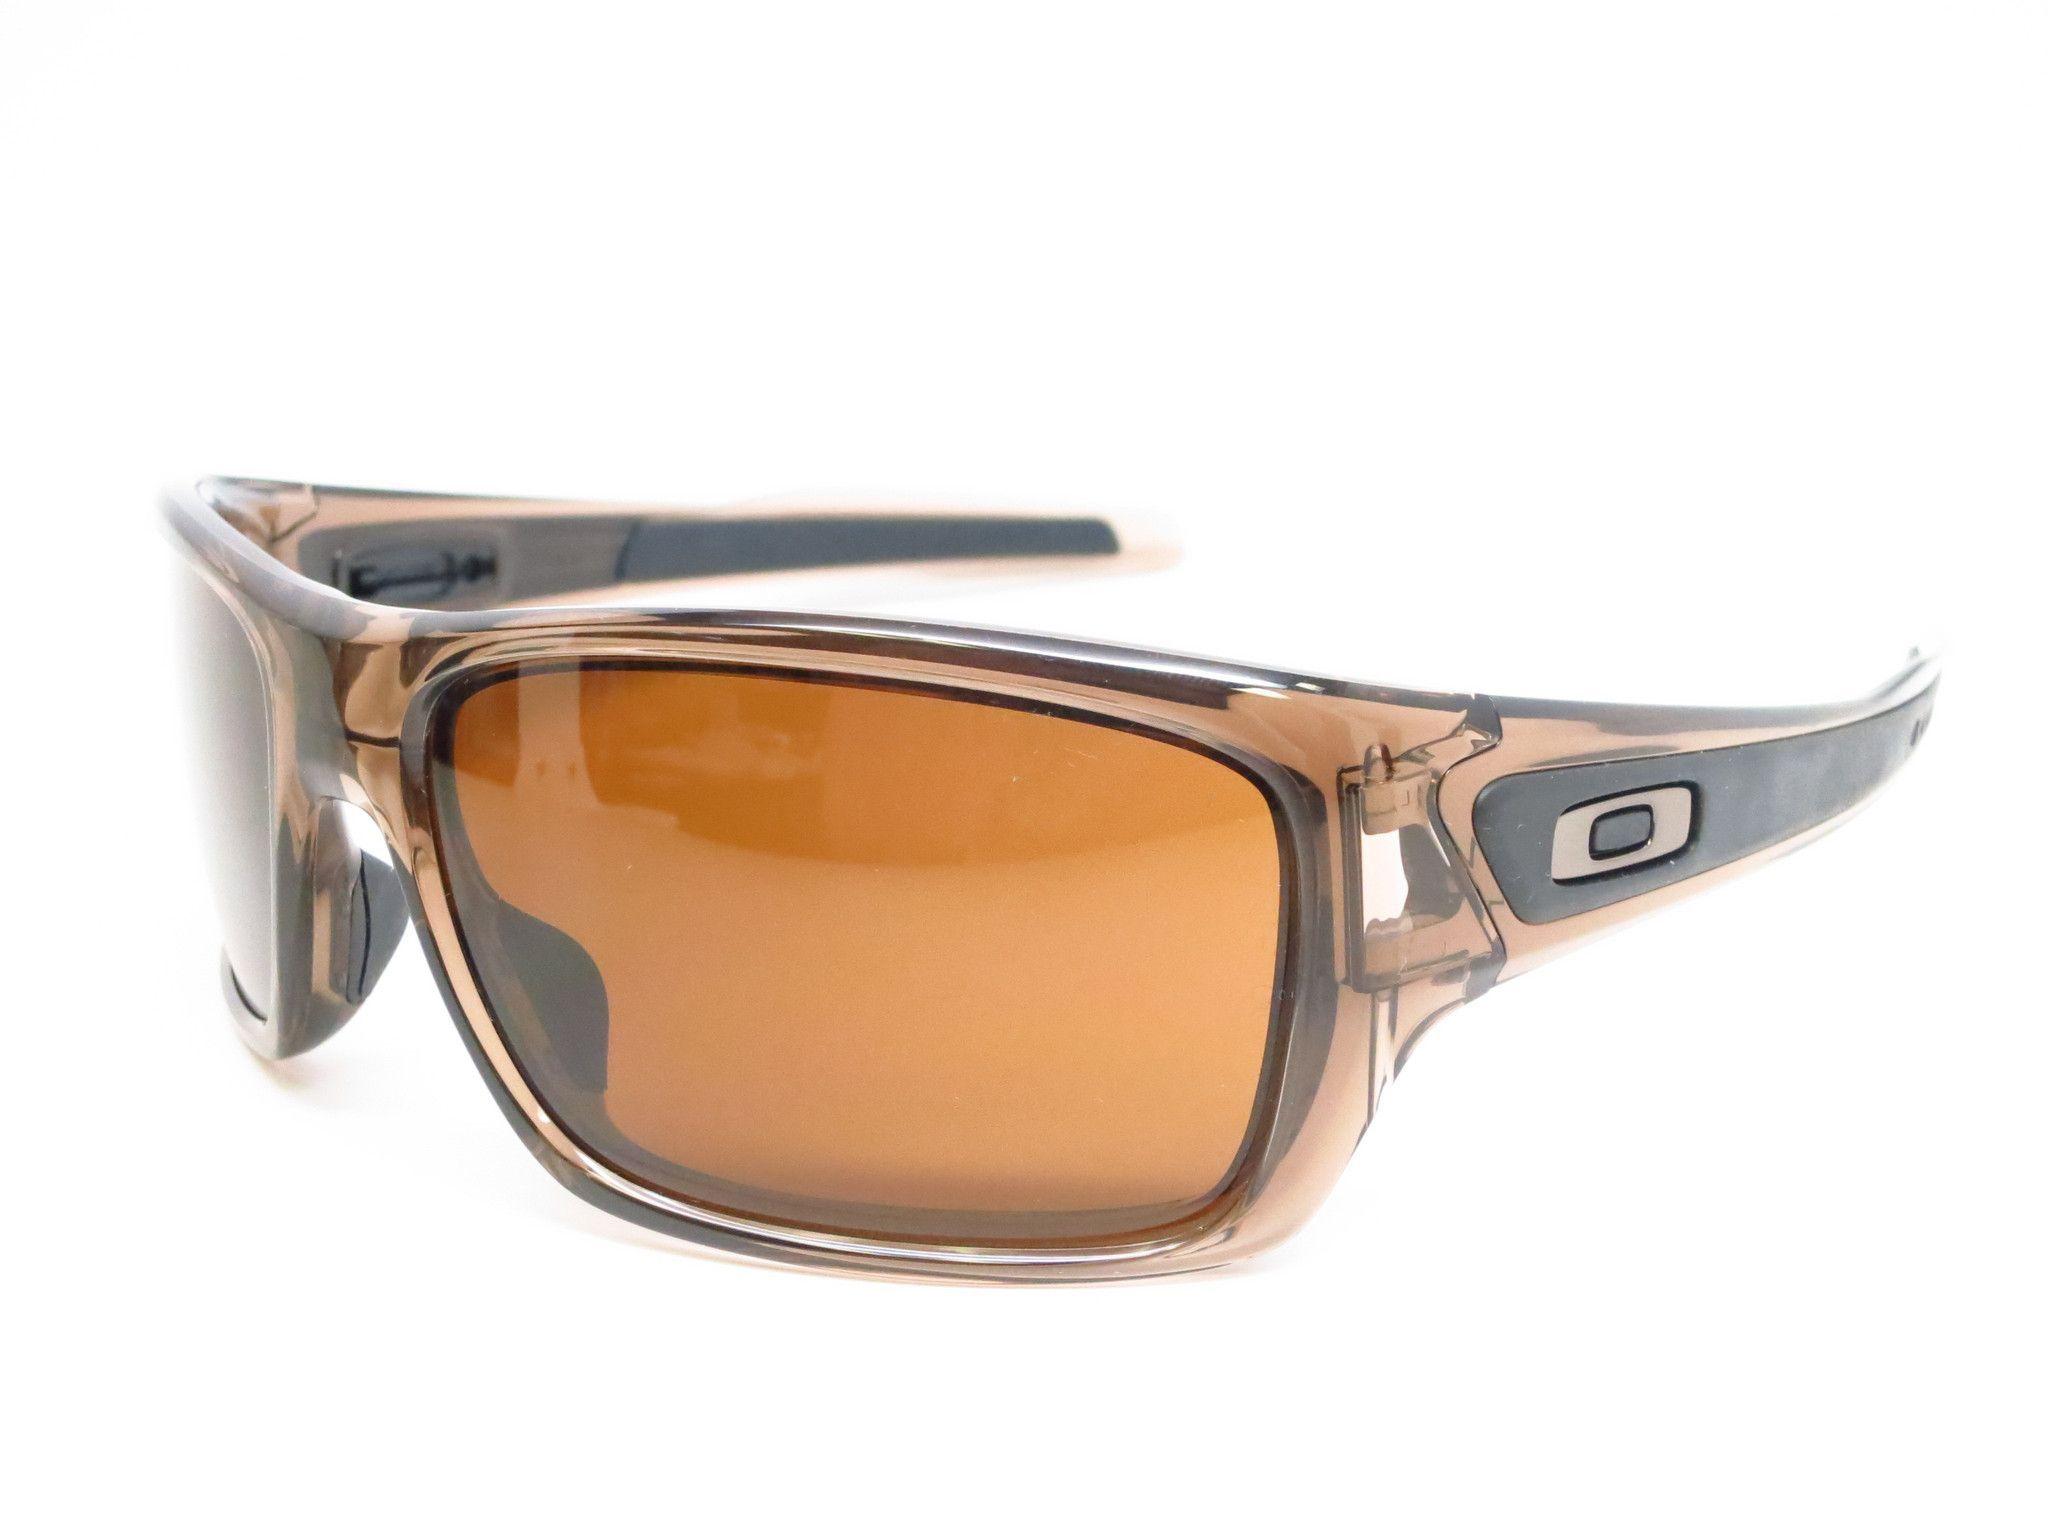 Óculos De Sol · Oakley Turbine OO9263-02 Brown Sunglasses c6c7b3cbb9